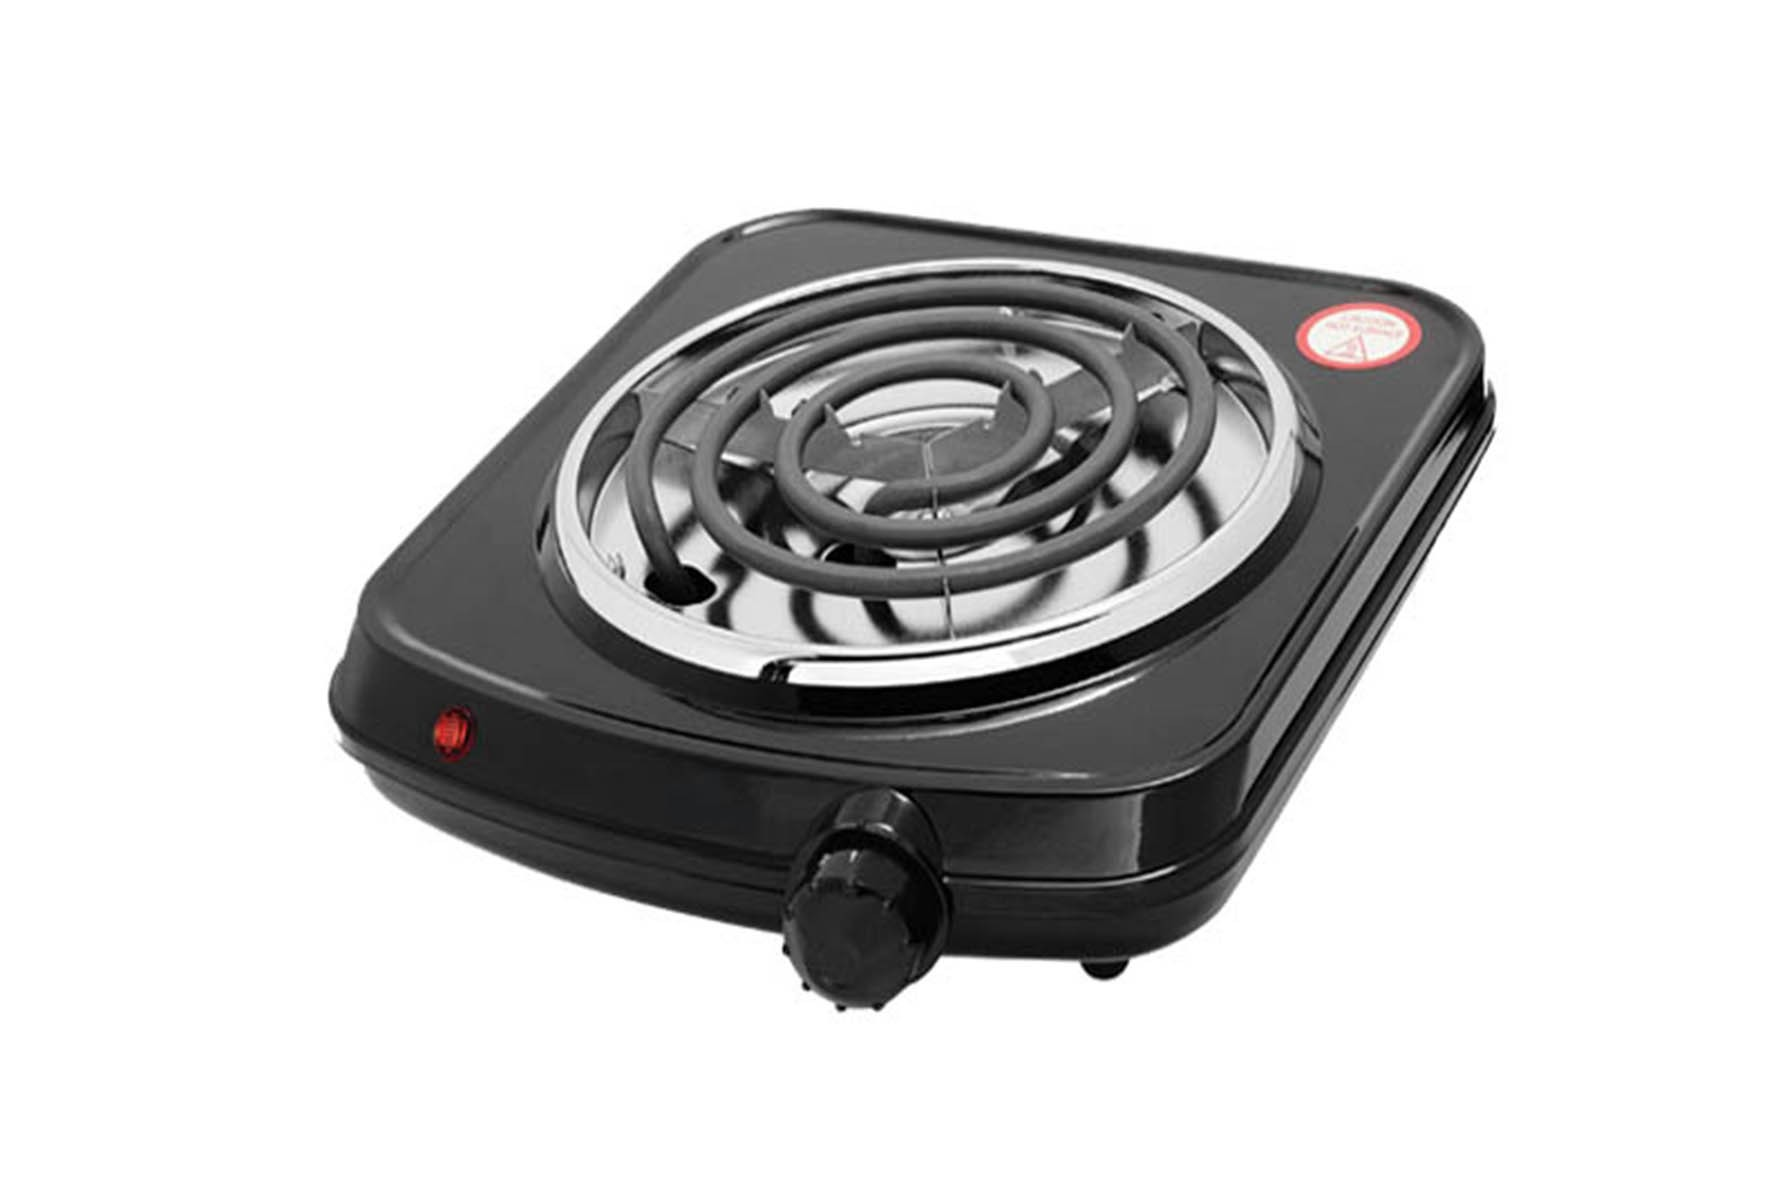 Electric Kitchen Appliances Store Online - Buy Kitchen ...